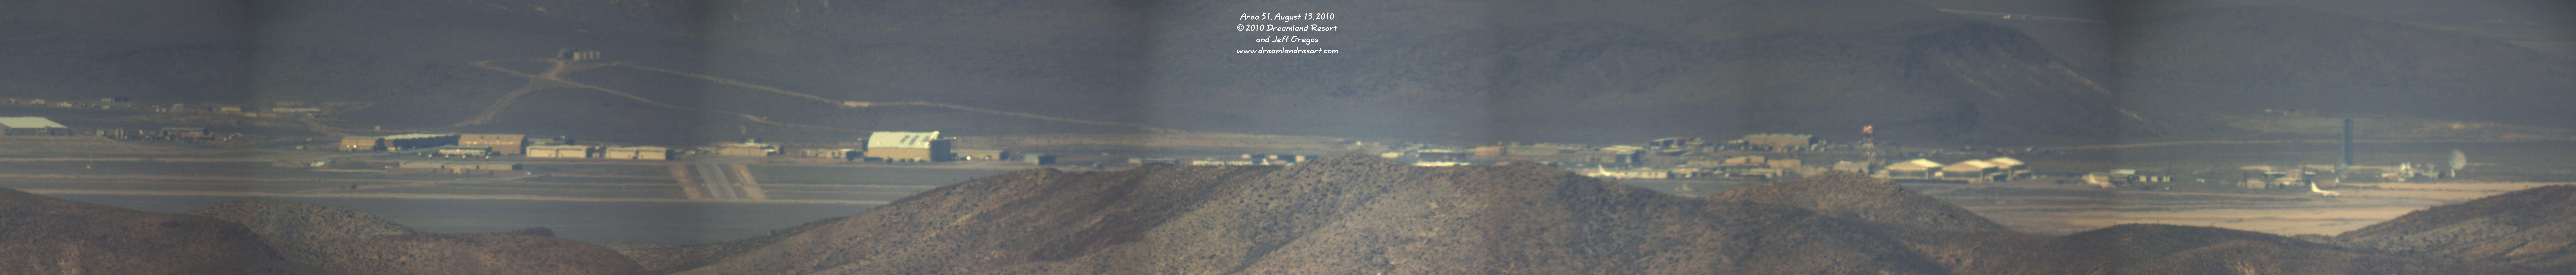 2012-08-02-panorama_0810_2.jpg